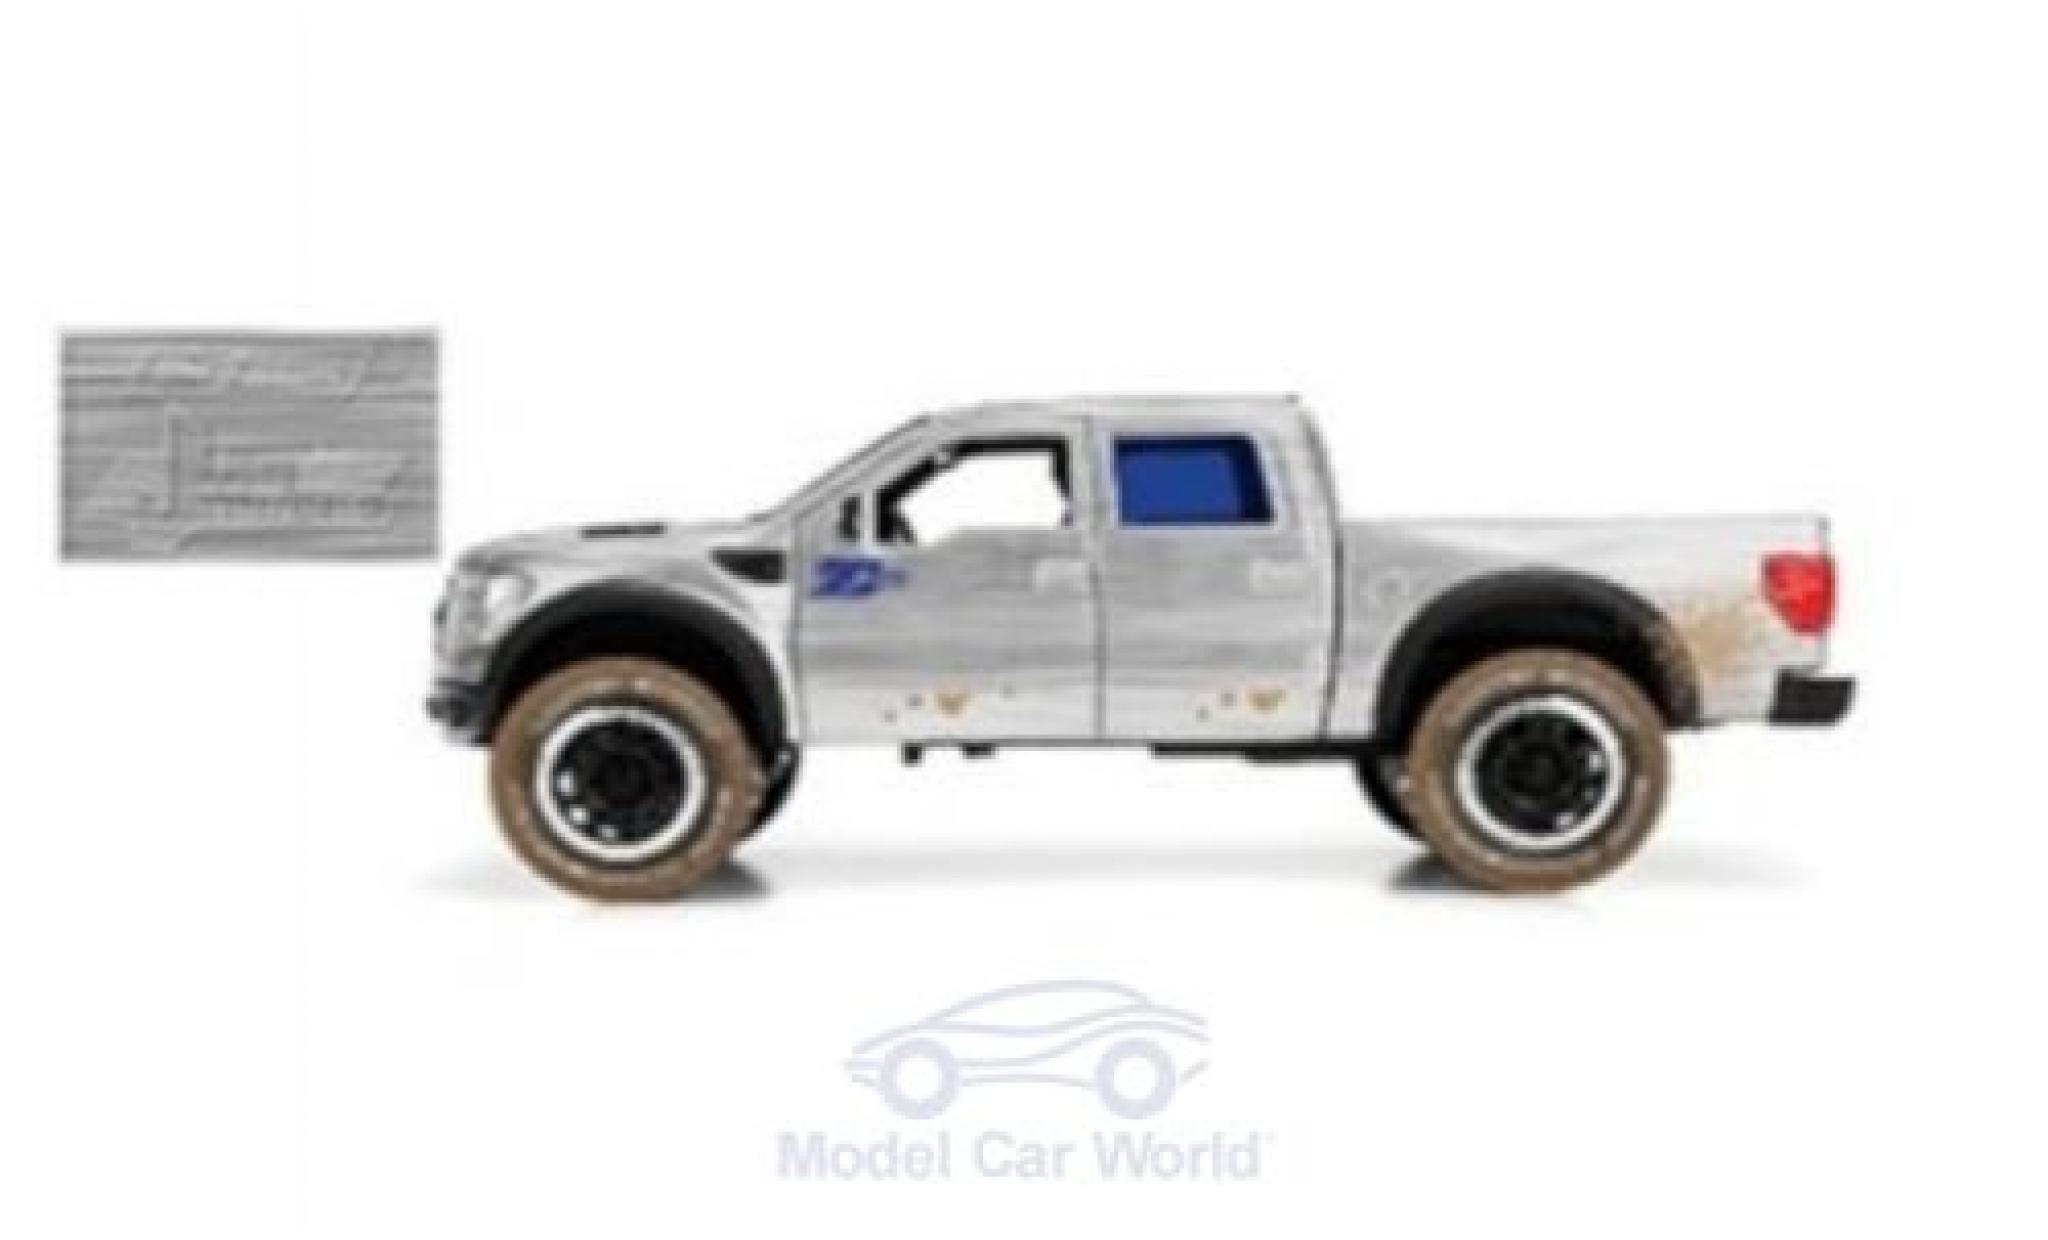 Ford F-1 1/24 Jada Toys Toys Toys Toys 50 SVT Raptor grise/bleue 2011 mit Schmutzeffekt